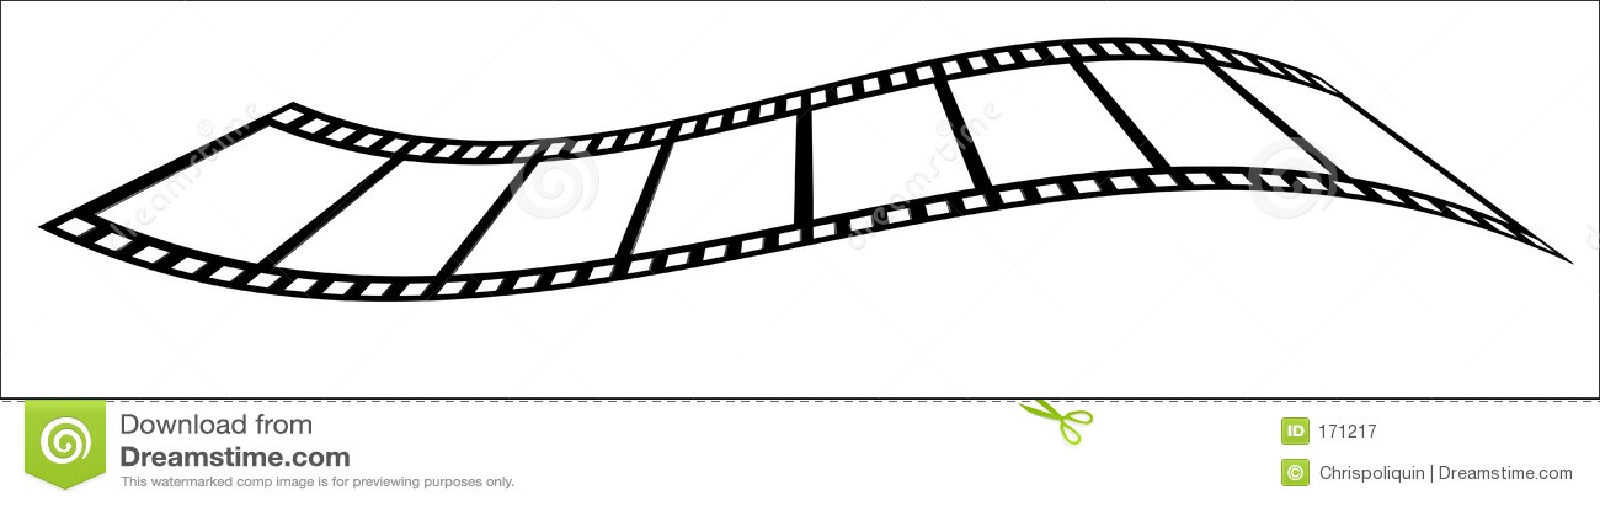 wavy film strip stock illustration illustration of camera film strip clip art picture frame film strip clip art no border